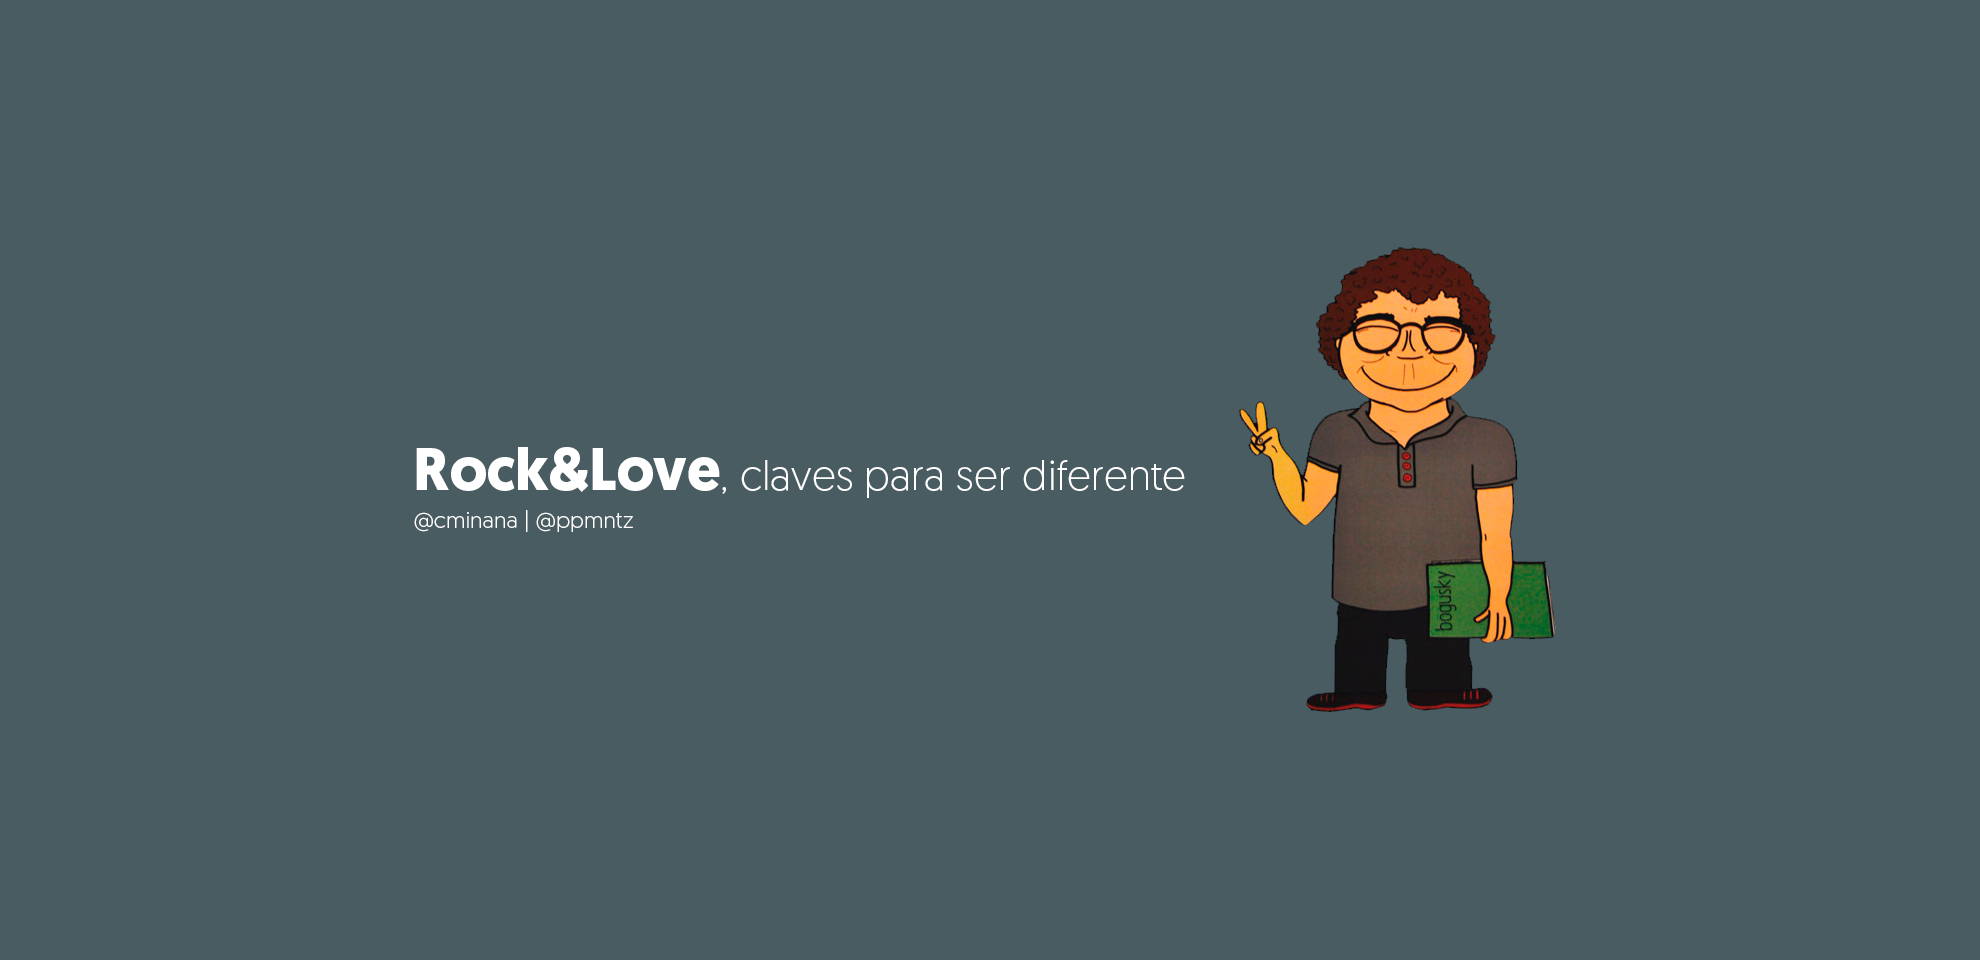 Rock&Love claves ser diferentes